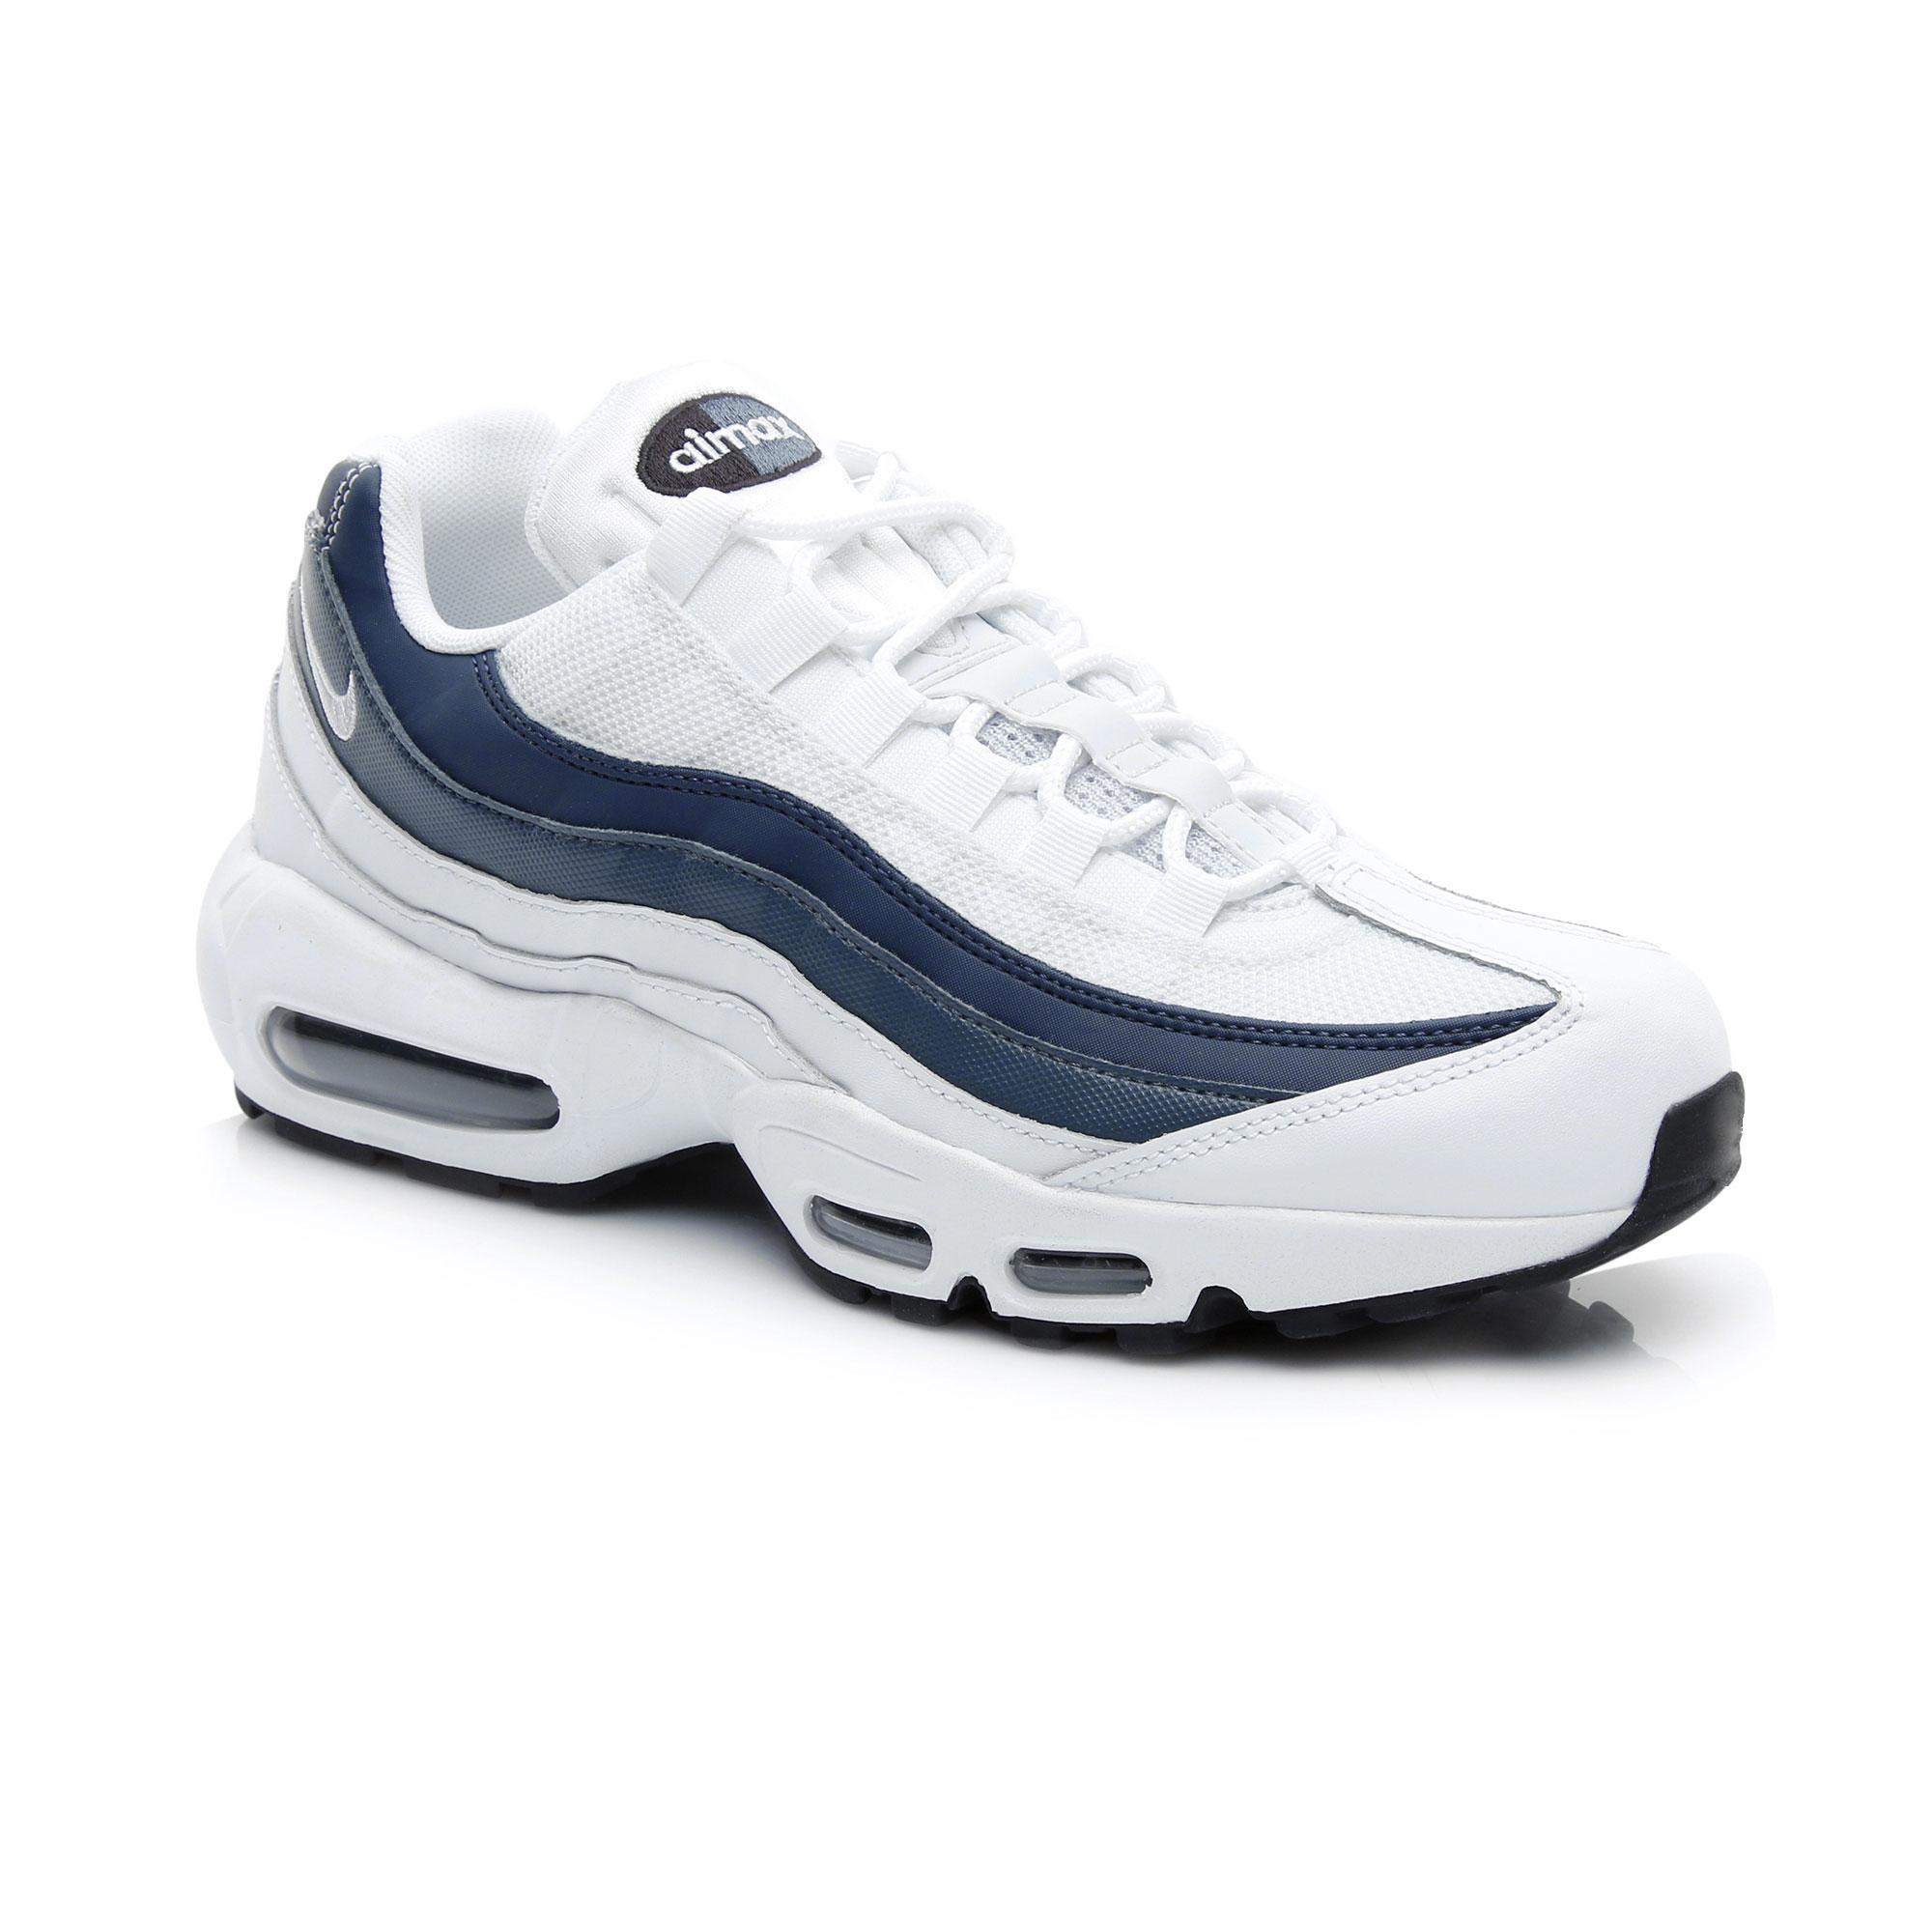 Nike Air Max 95 Essential Lacivert-Beyaz Spor Ayakkabı